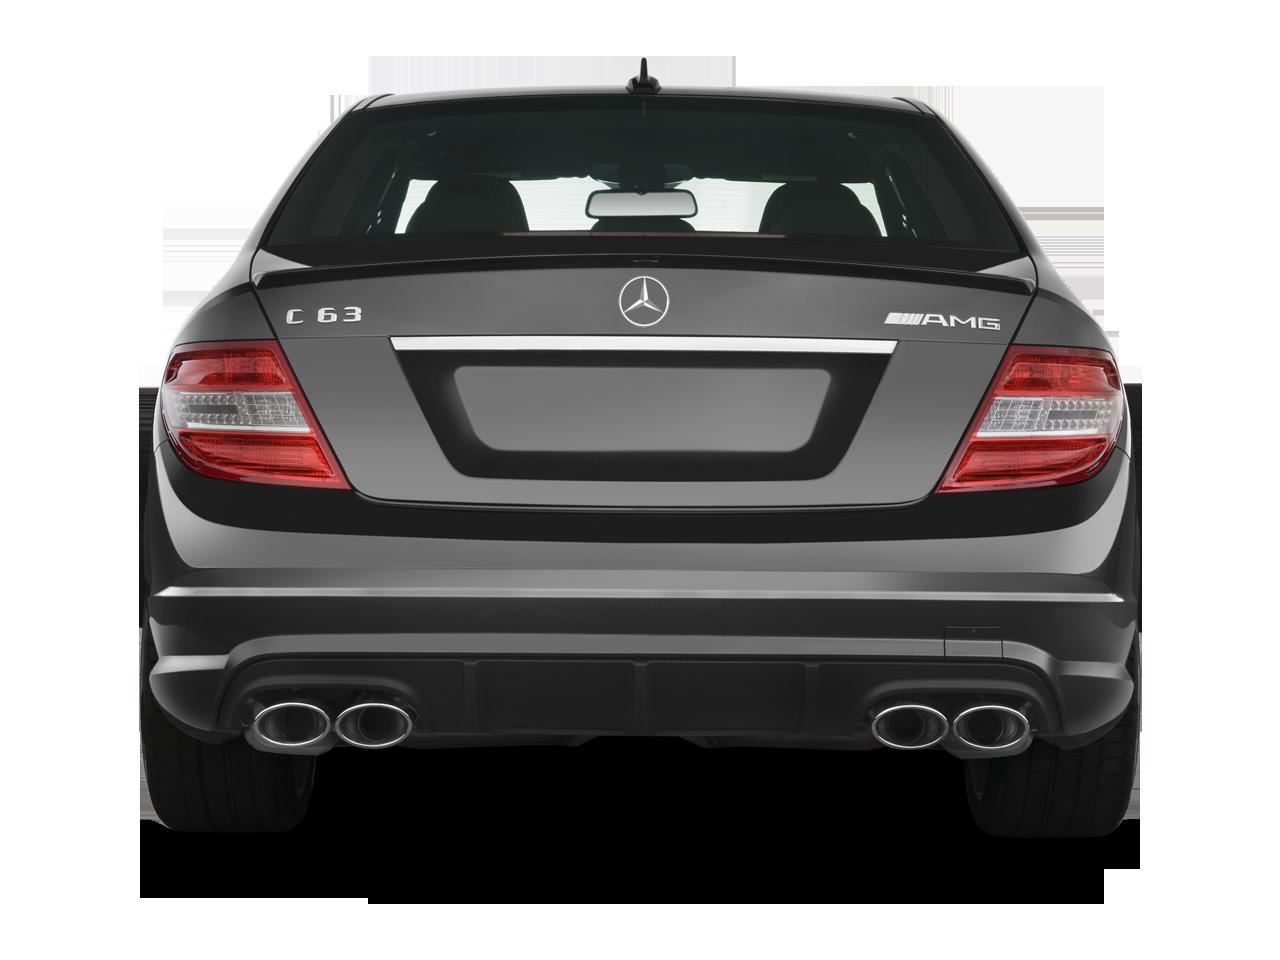 2009 mercedes benz c300 mercedes benz luxury sedan. Black Bedroom Furniture Sets. Home Design Ideas